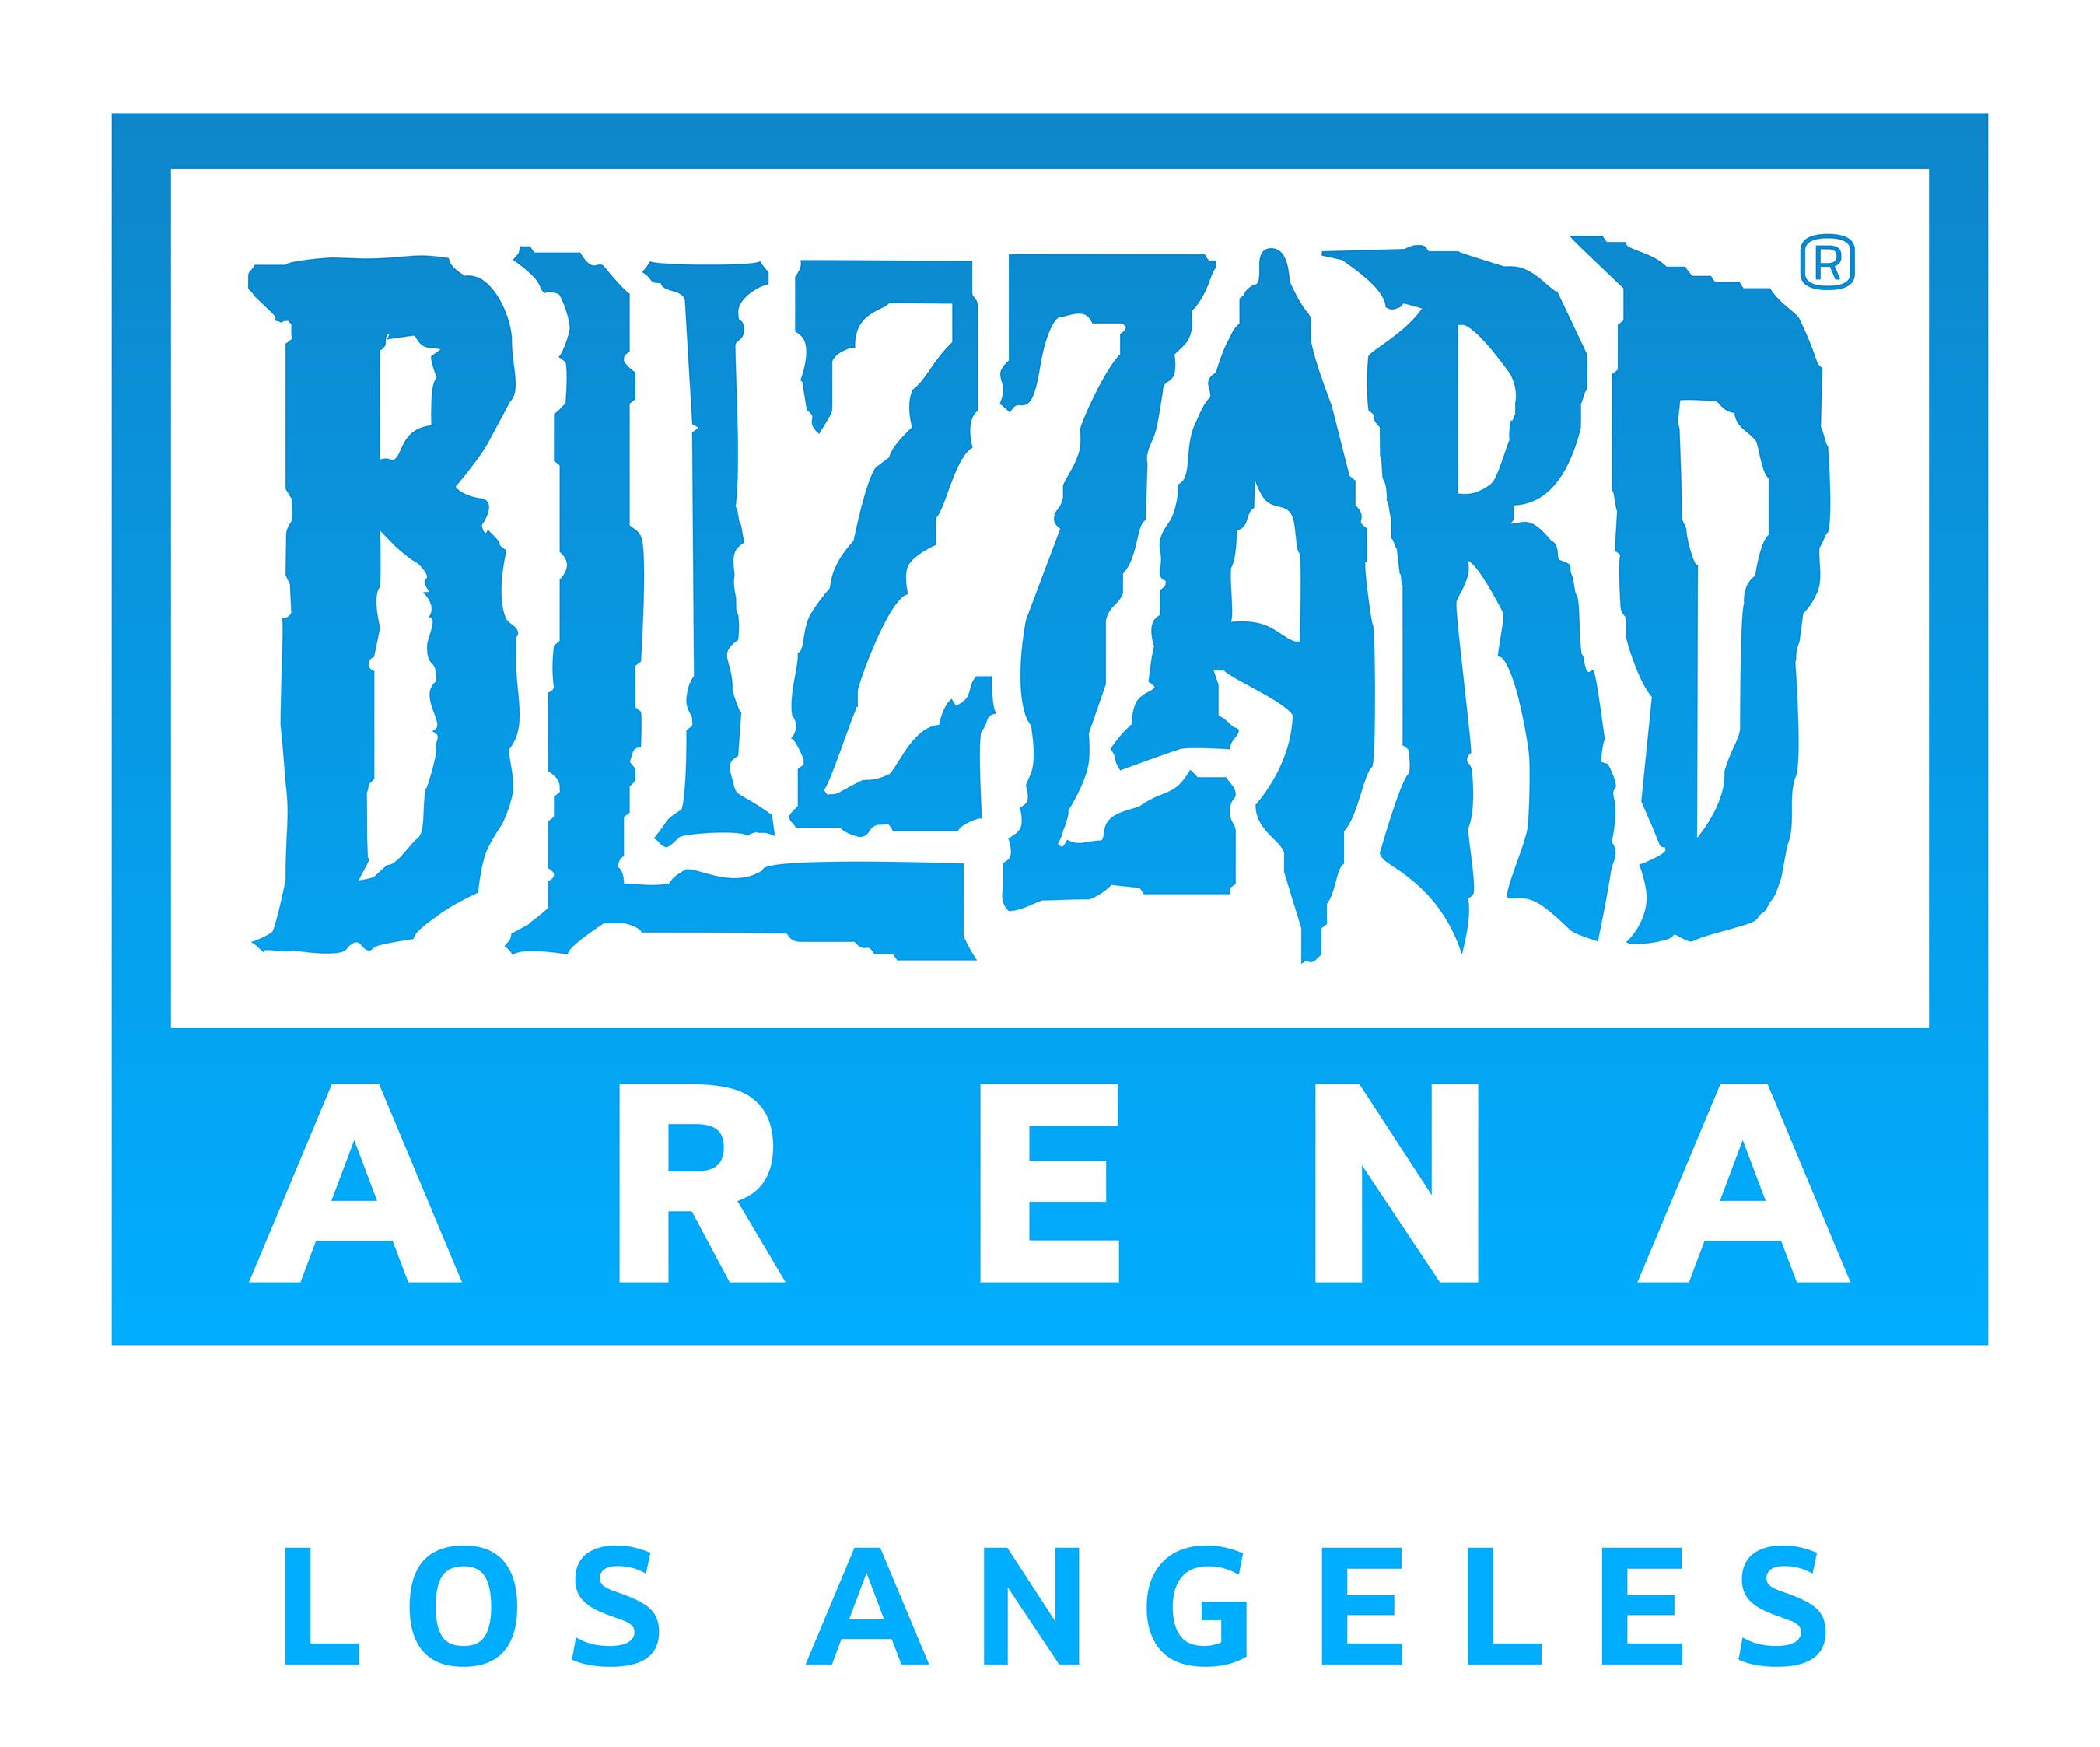 Blizzard Arena: New Home for Blizzard eSports